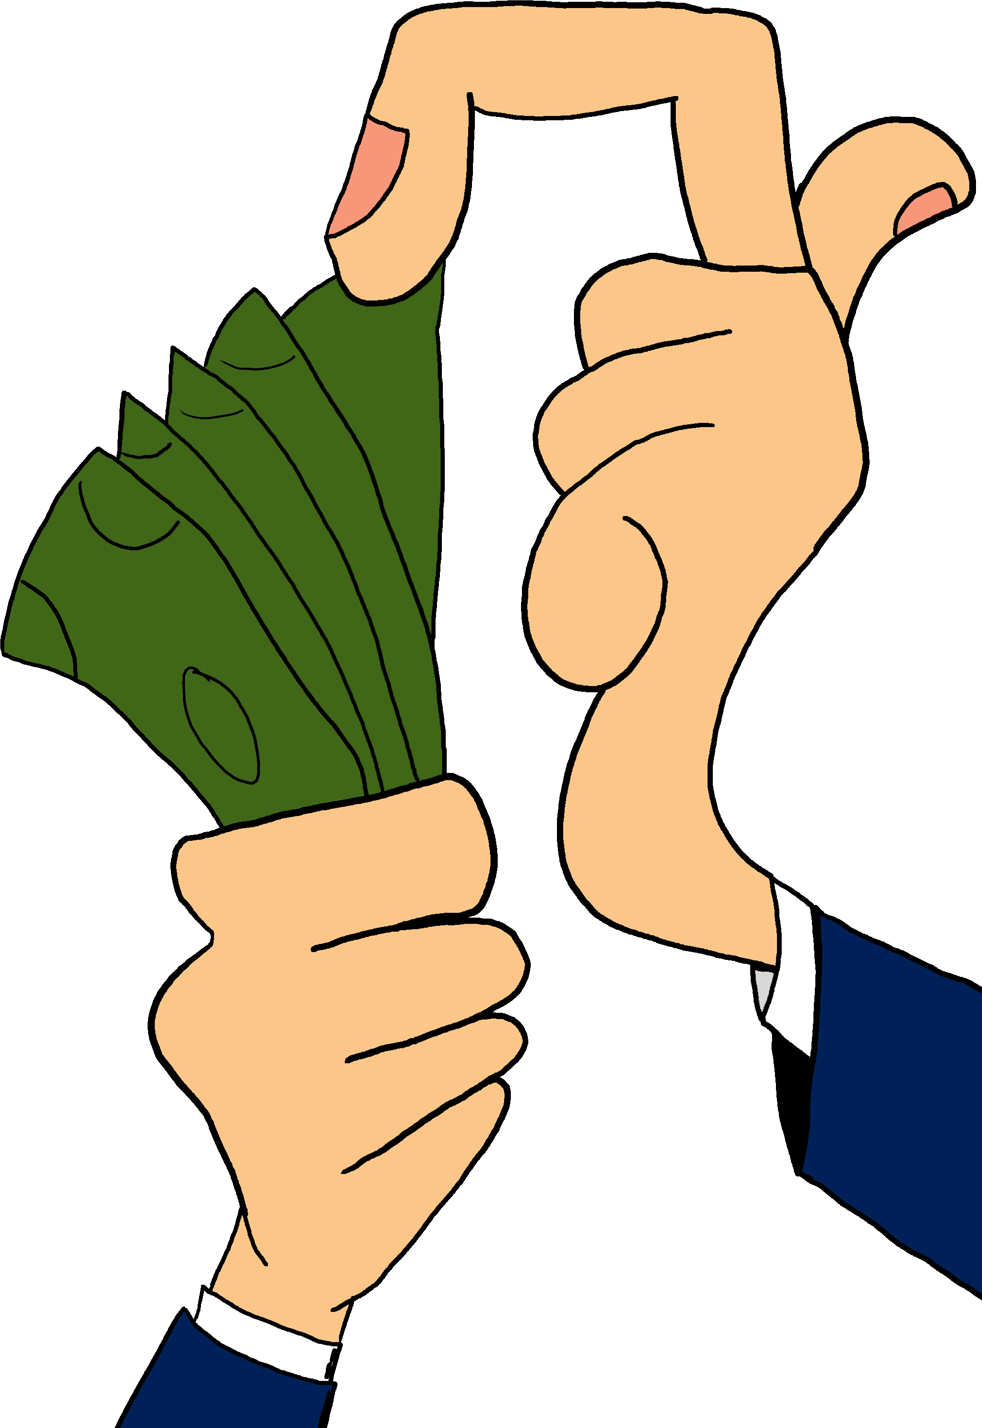 clipart money bags cliparts co free money clipart images free money clipart black and white